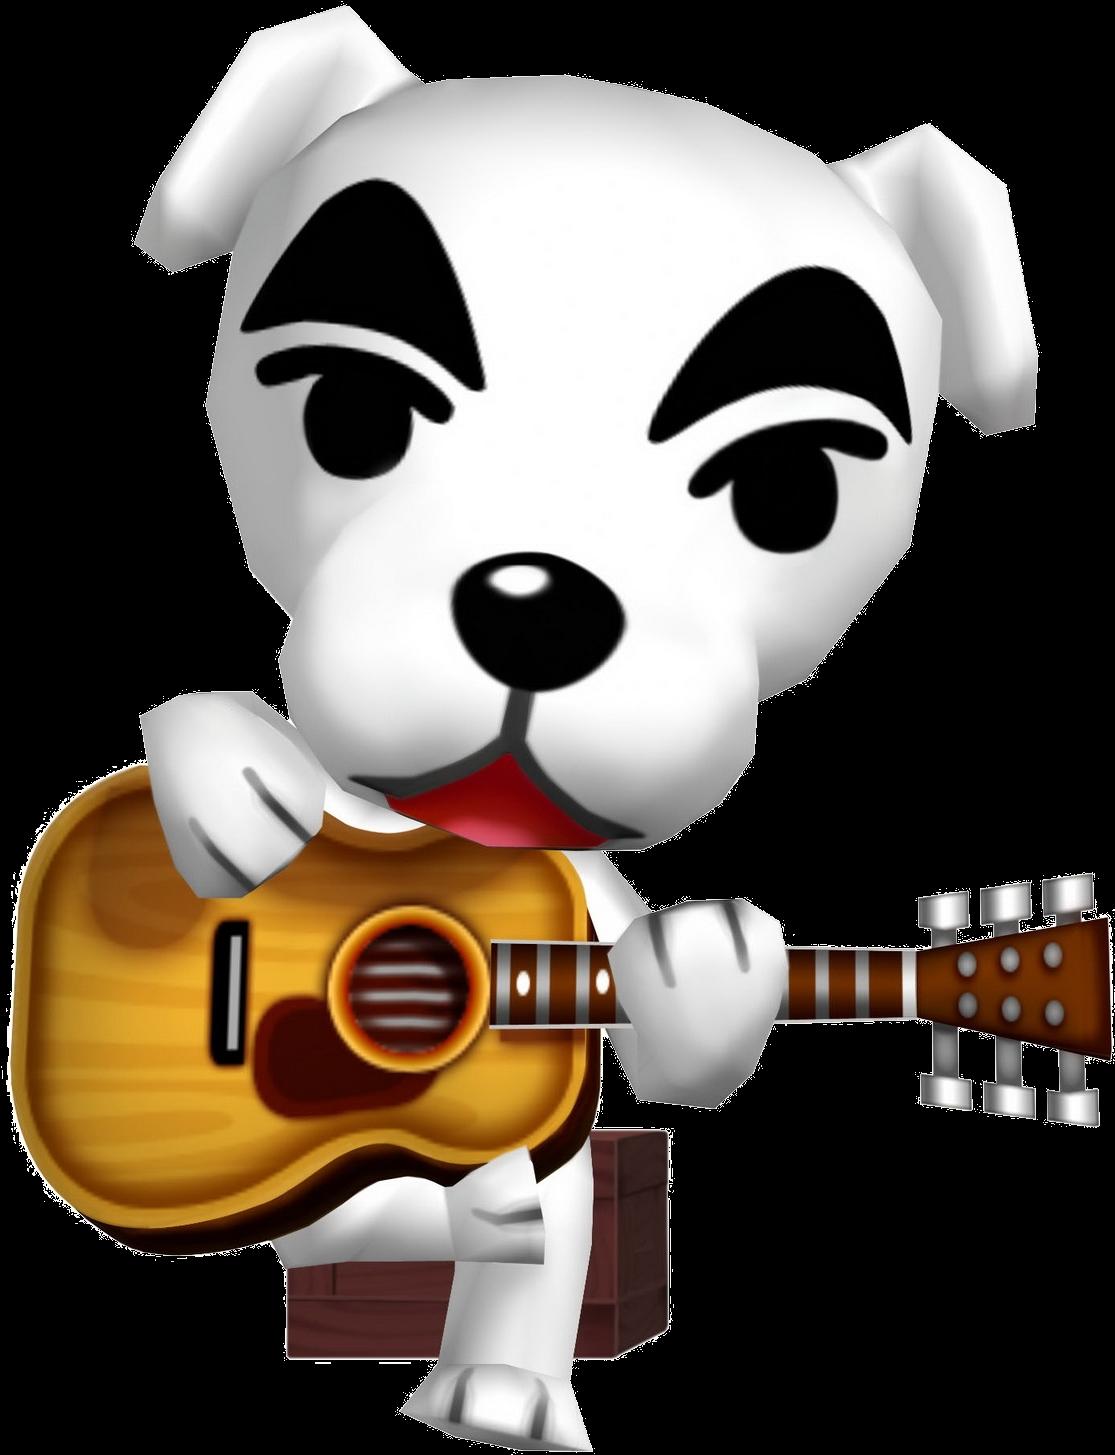 Download Animal Crossing Png Animal Crossing New Leaf Kk Full